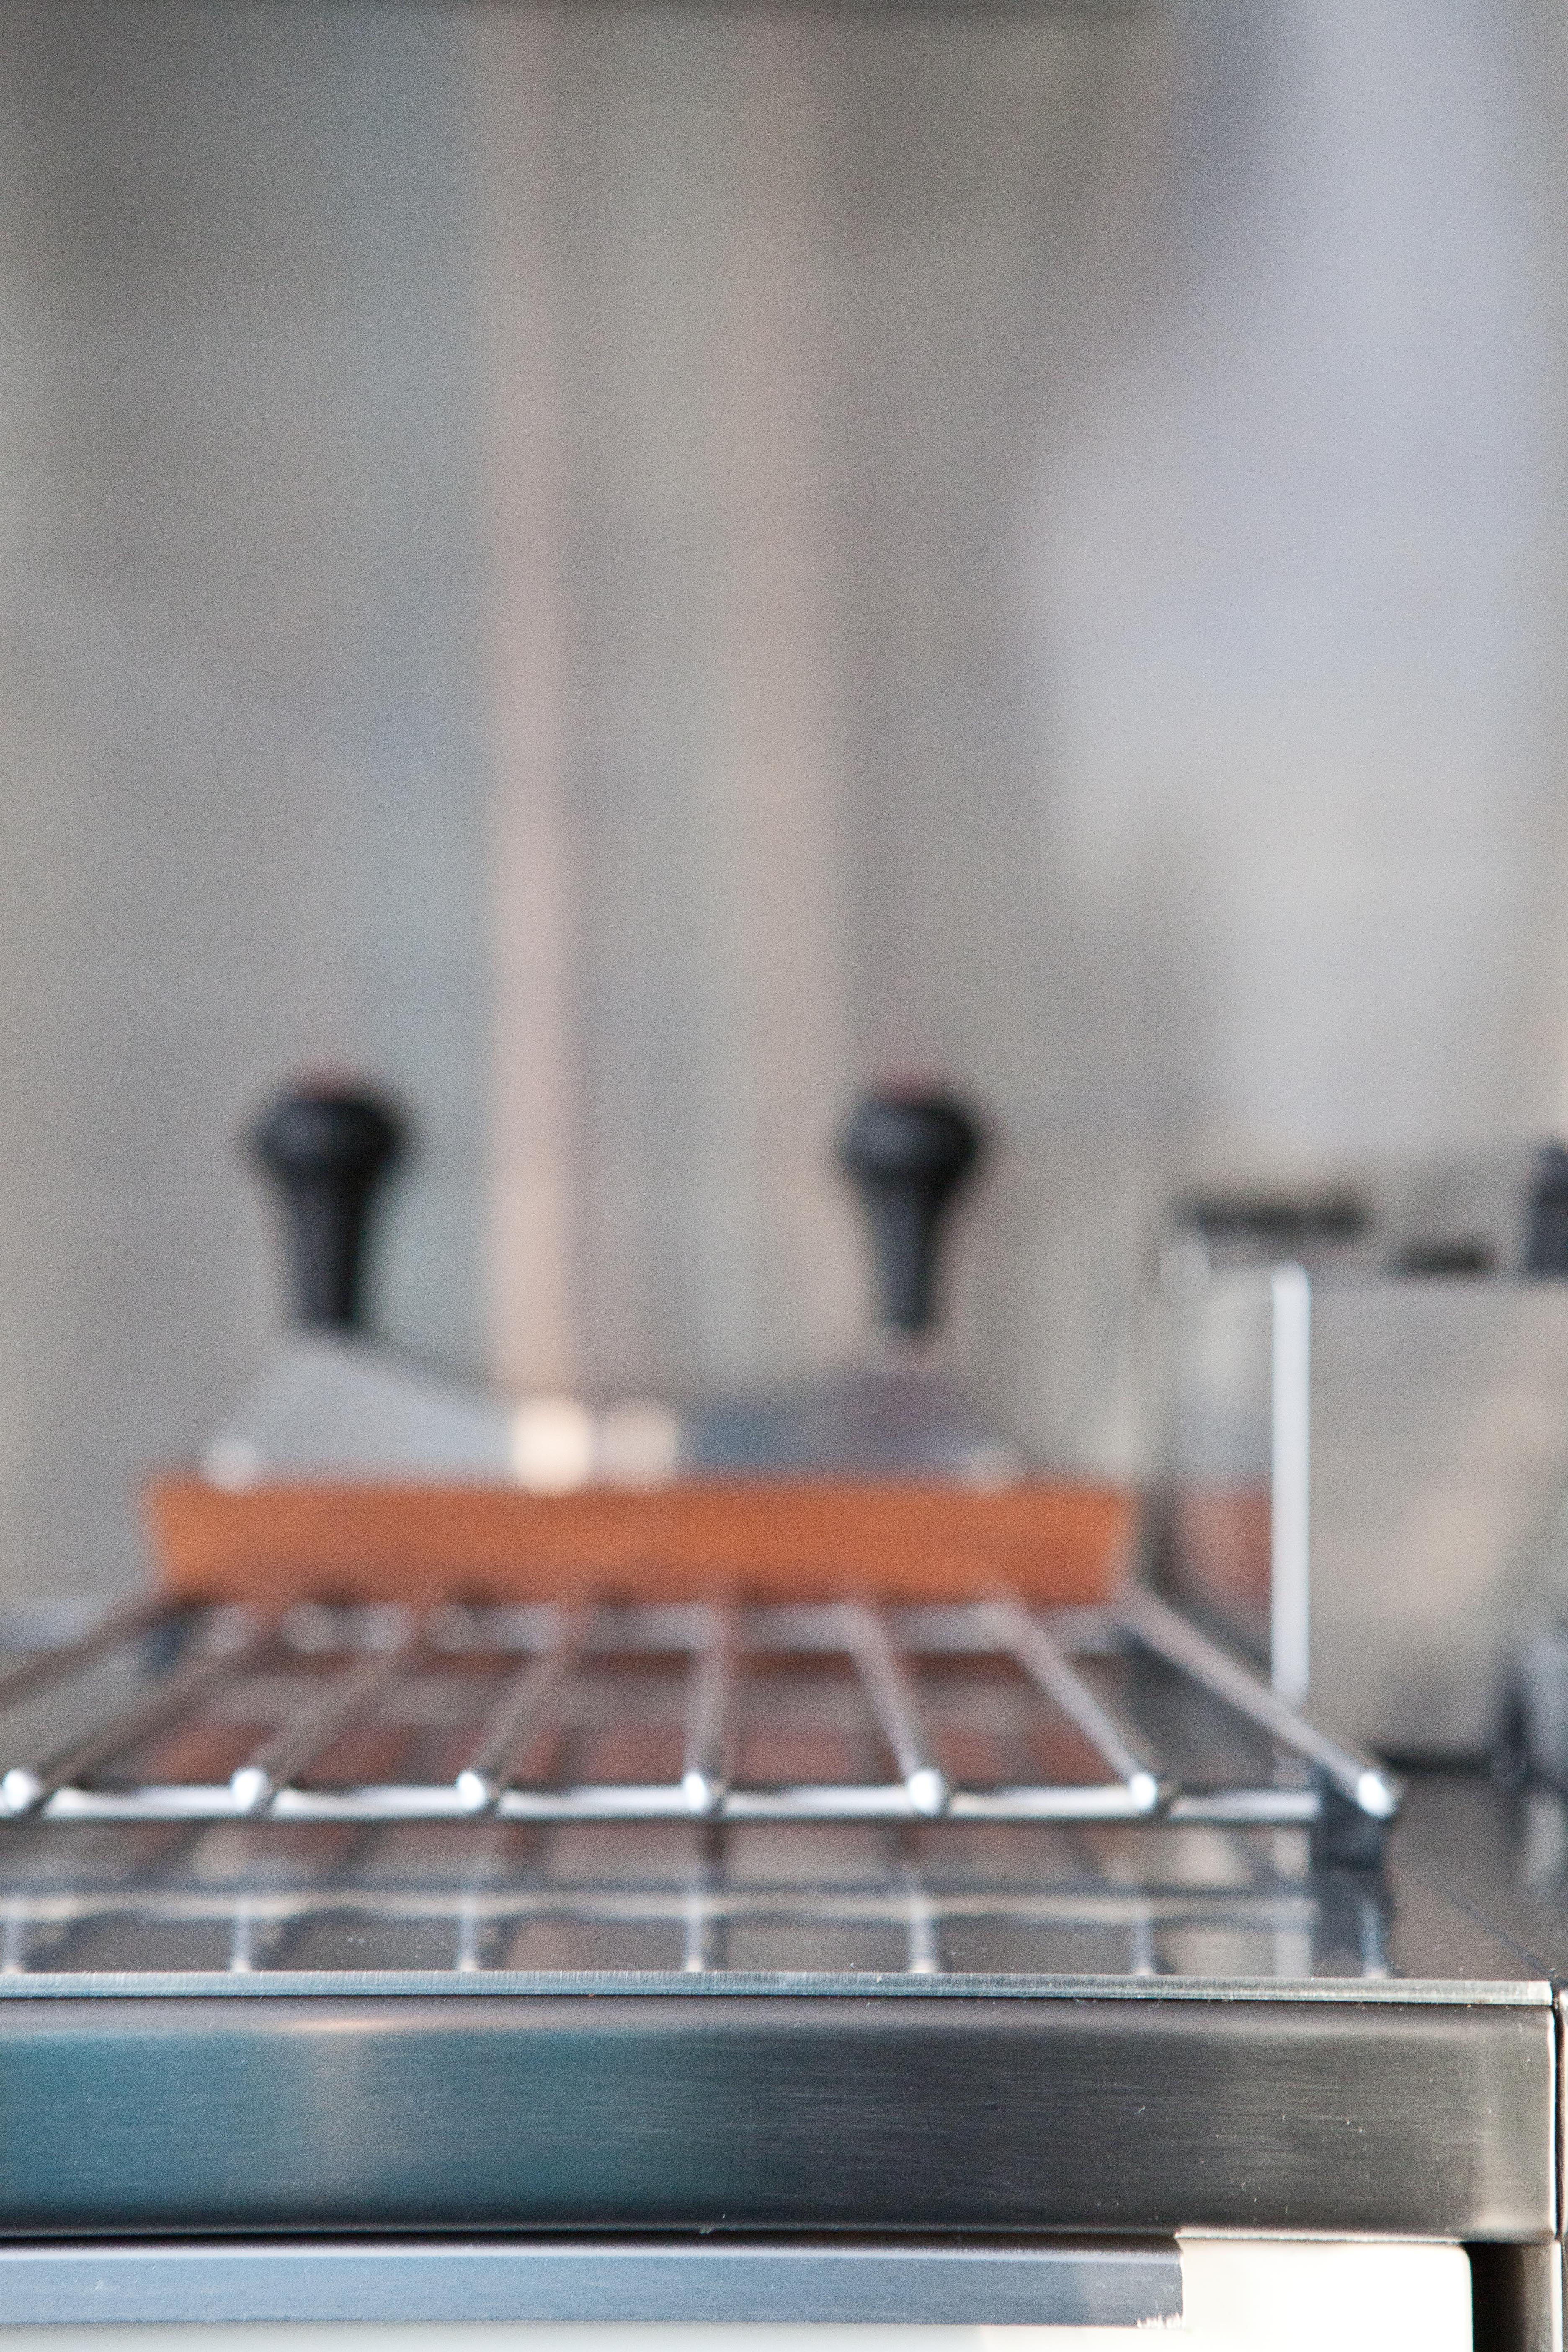 sur mesureacier inoxydable stainless stell capage cuisine sur mesure